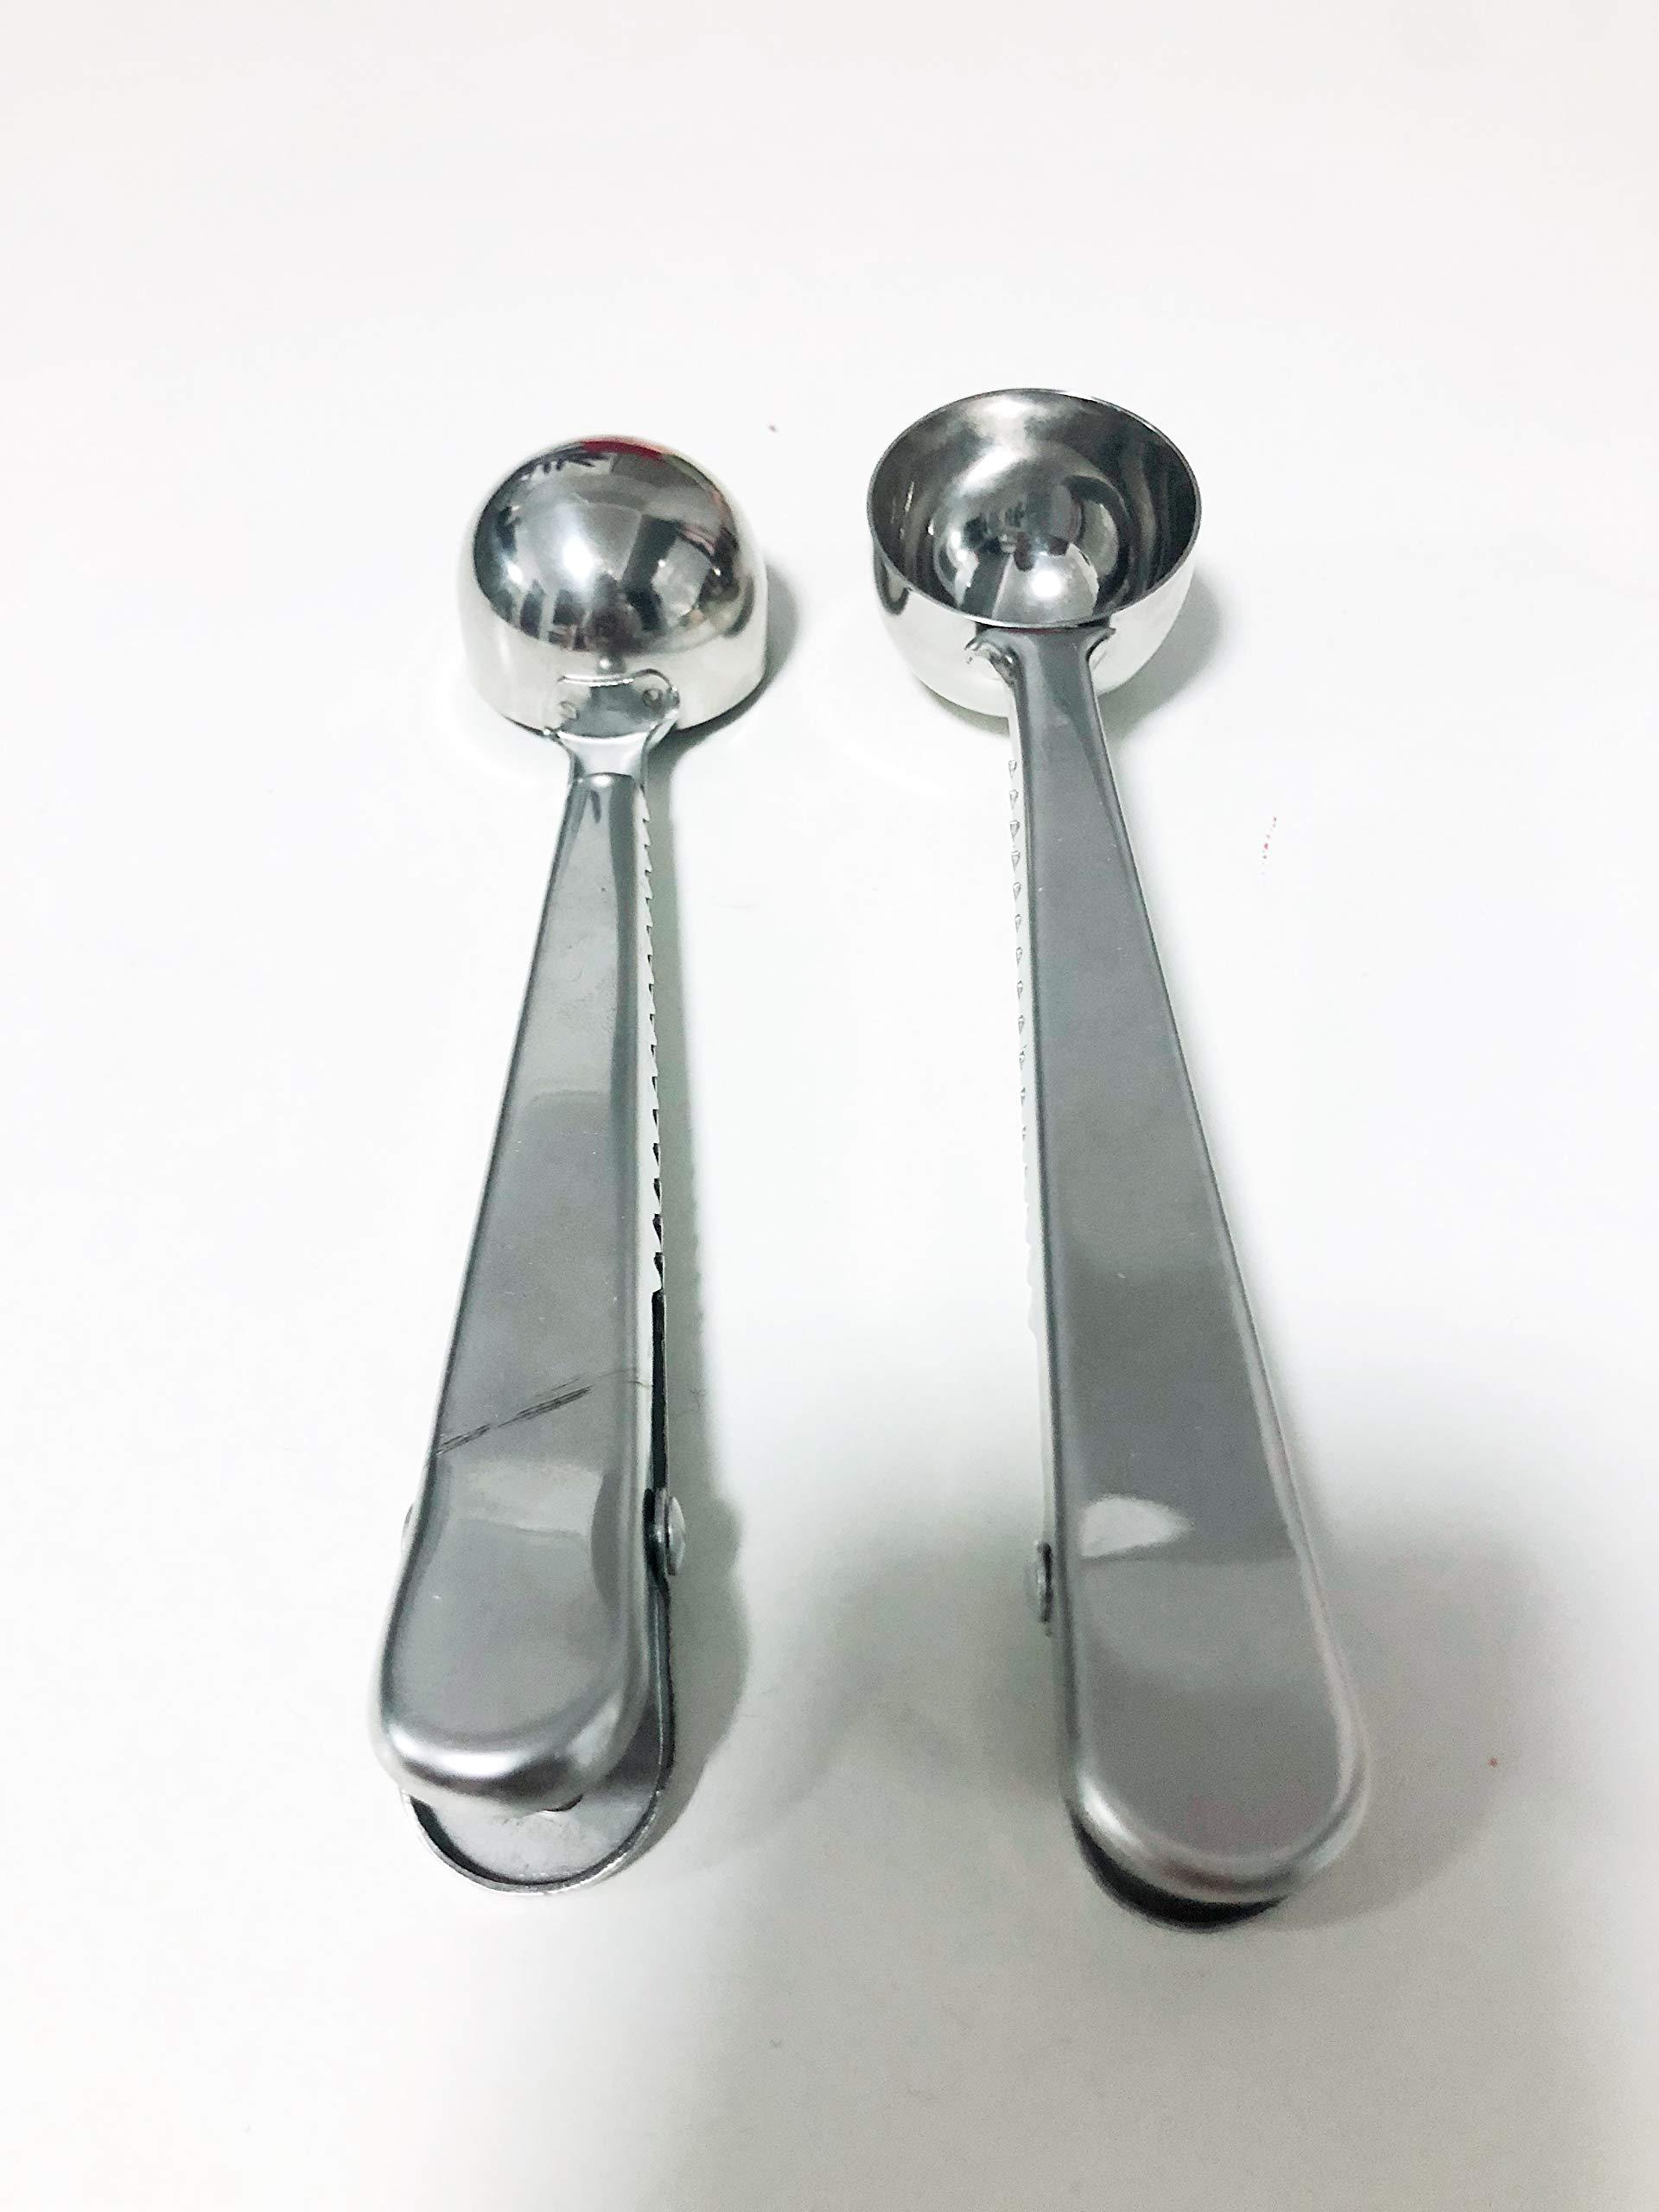 Stainless Steel Two-in-one Durable Bag Grip Clip & Coffee Spoon/Tea Scooper Food Storage - 2 Pack